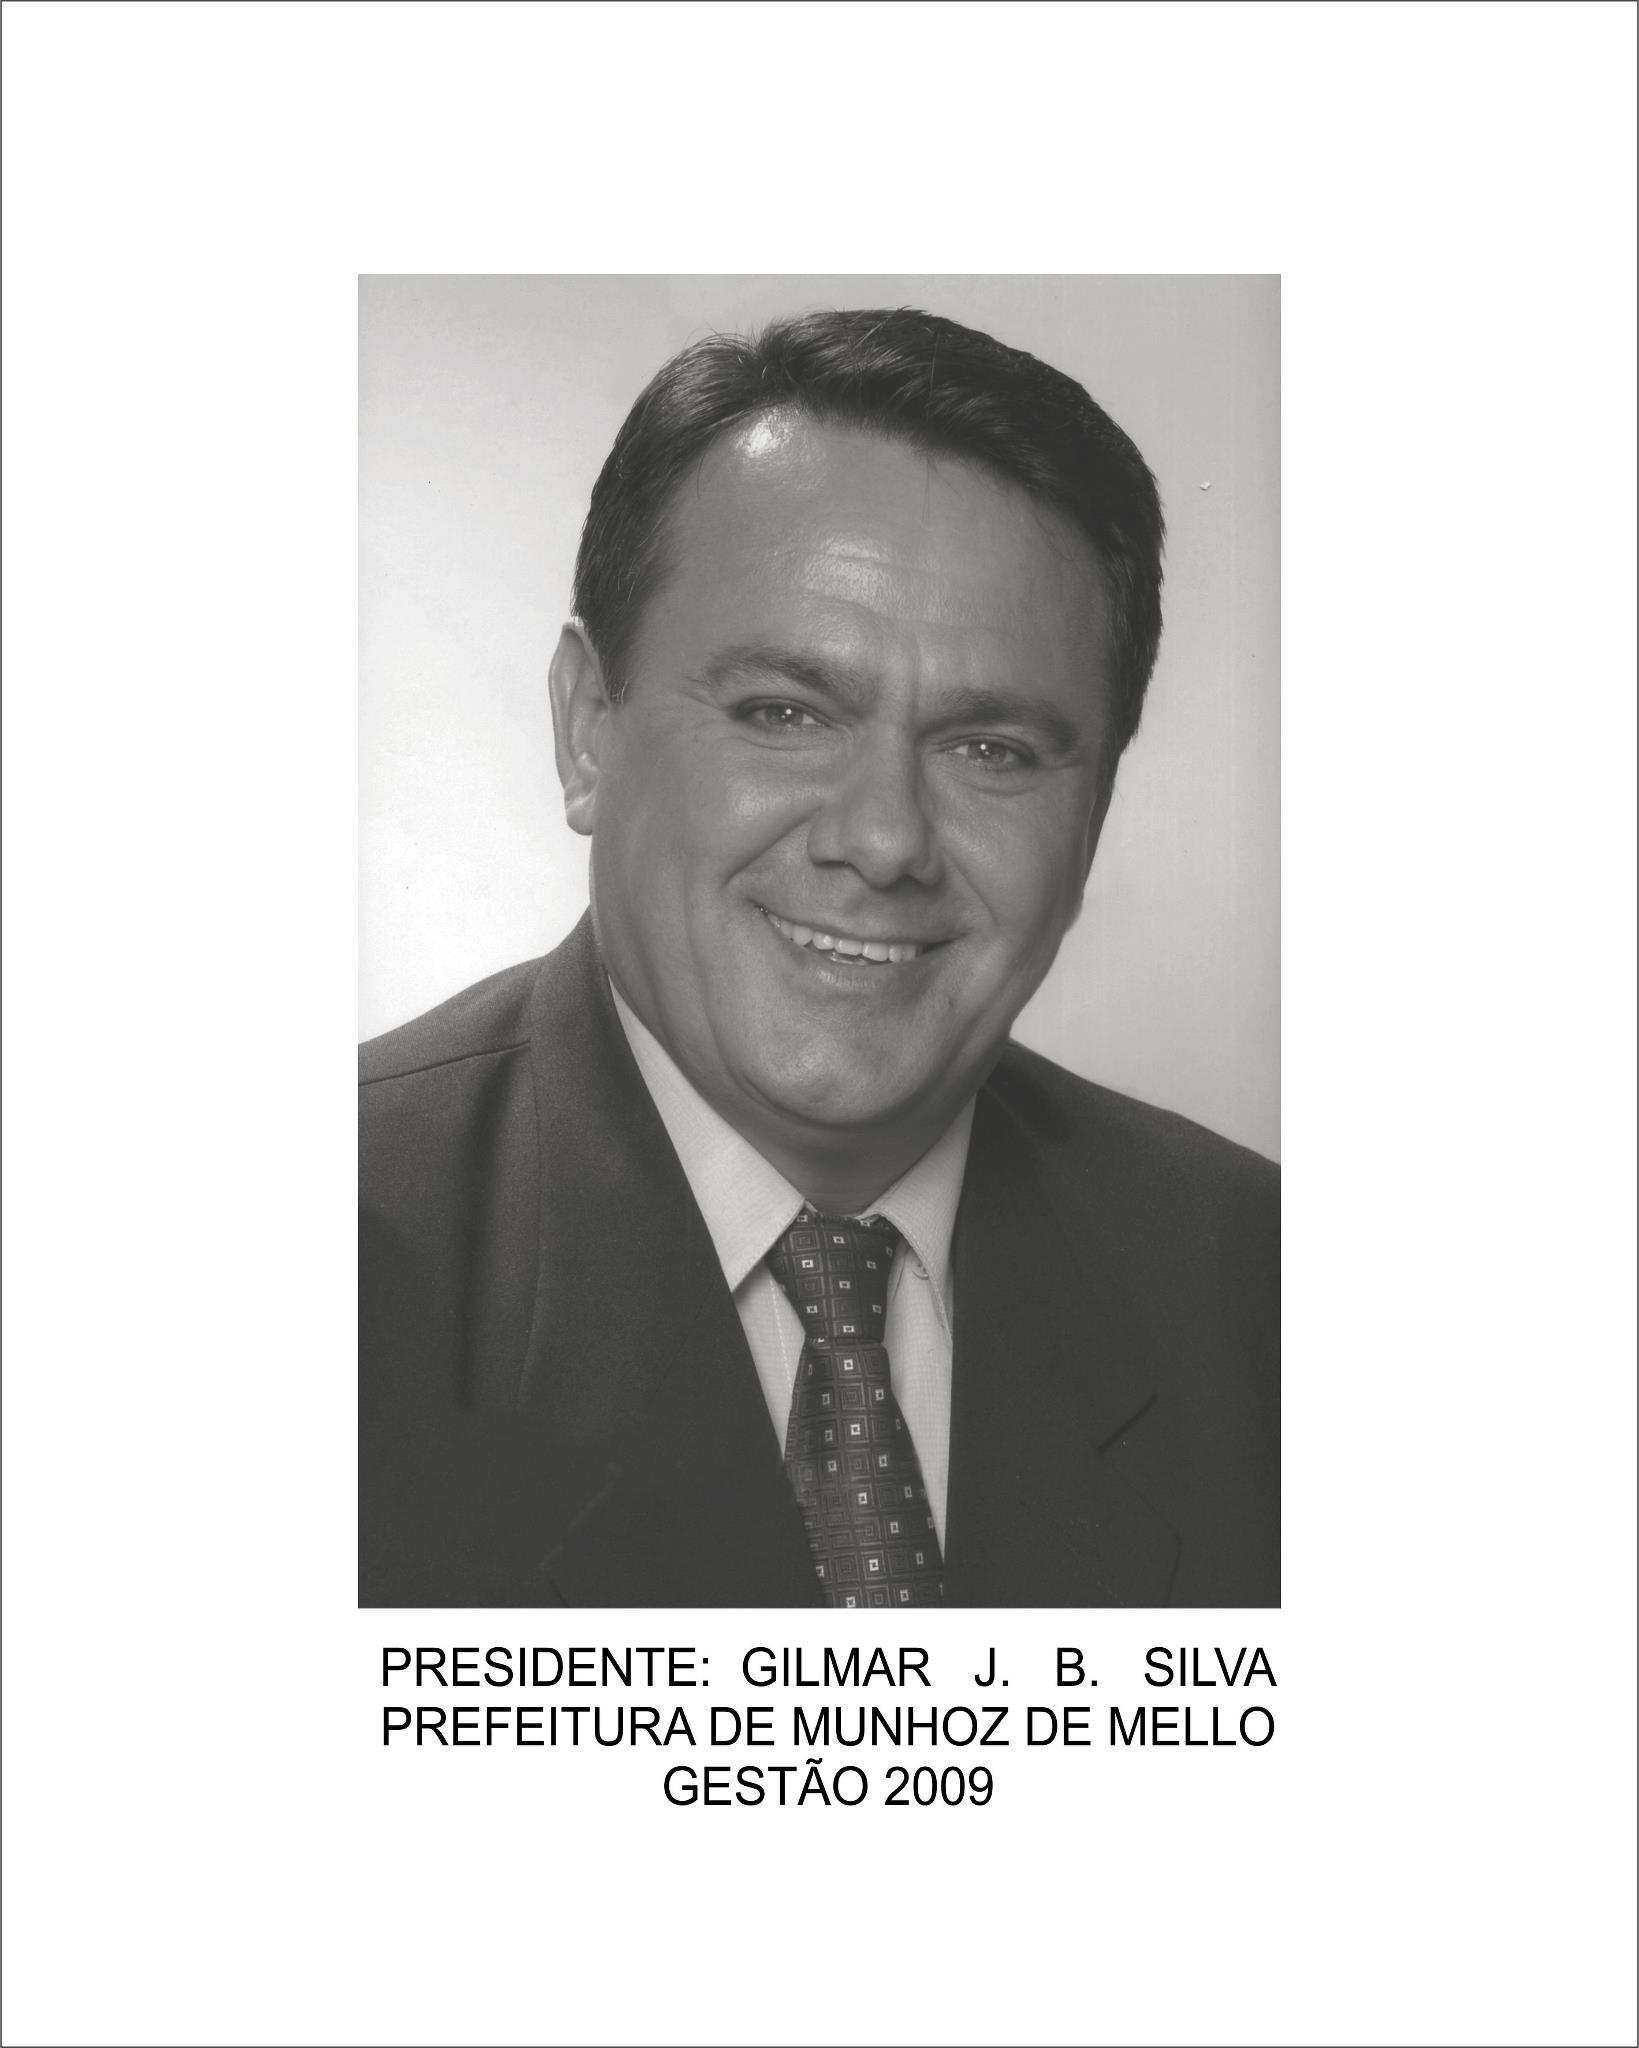 Gilmar José Benkendorf Silva